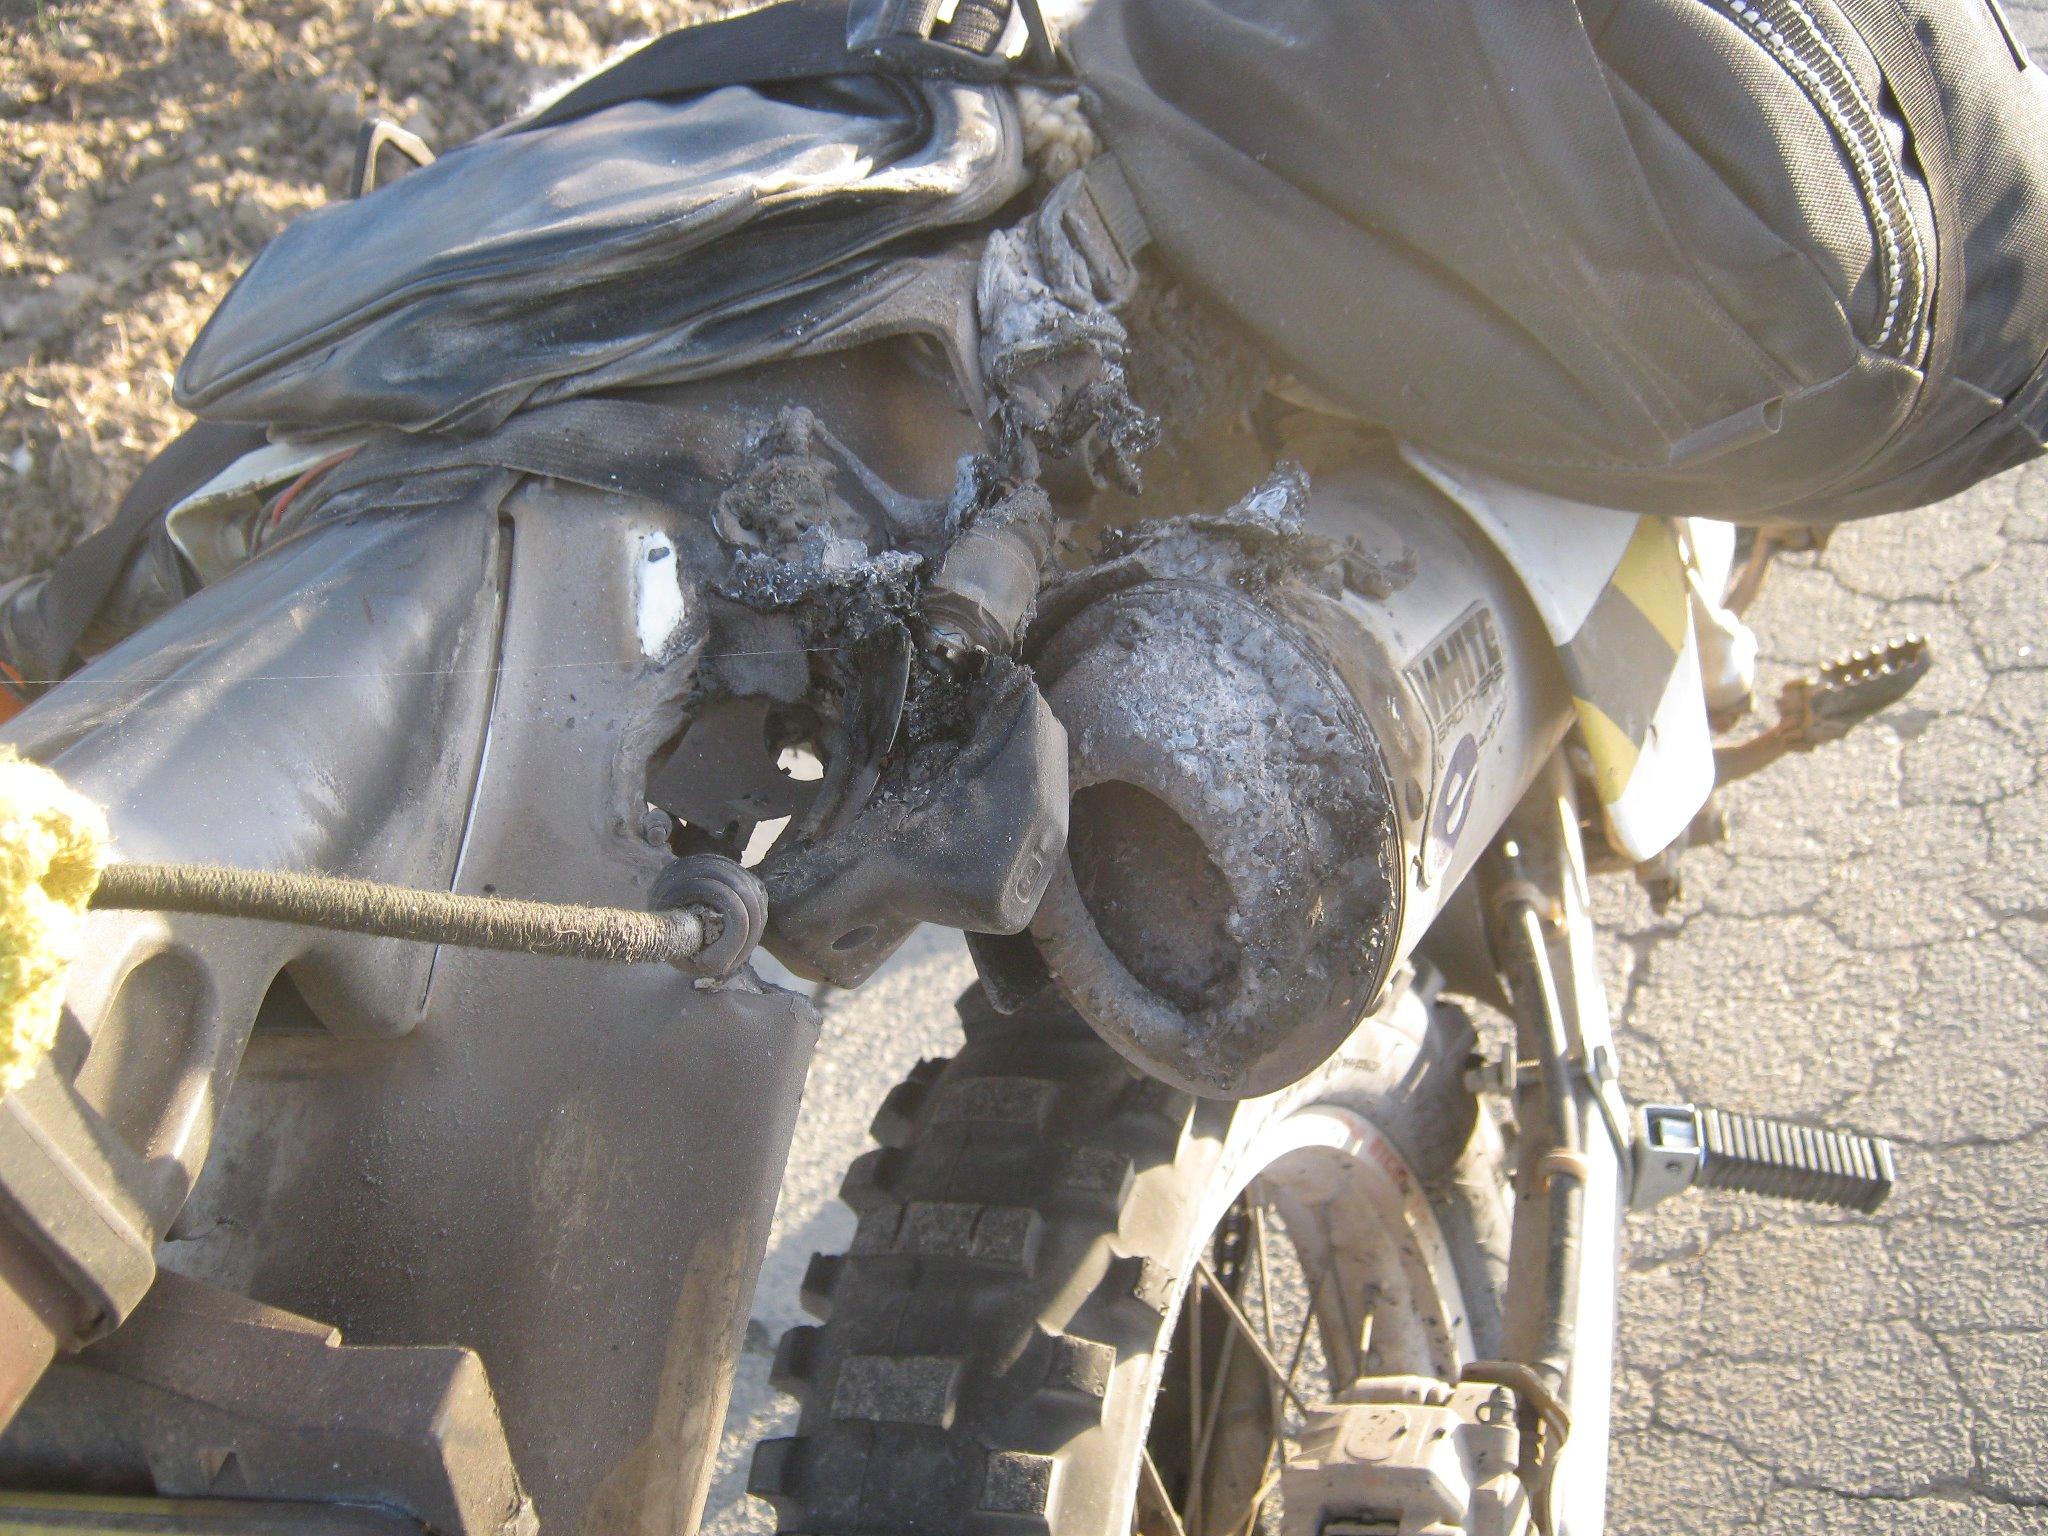 motorbike exhaust burns the stuff beside it